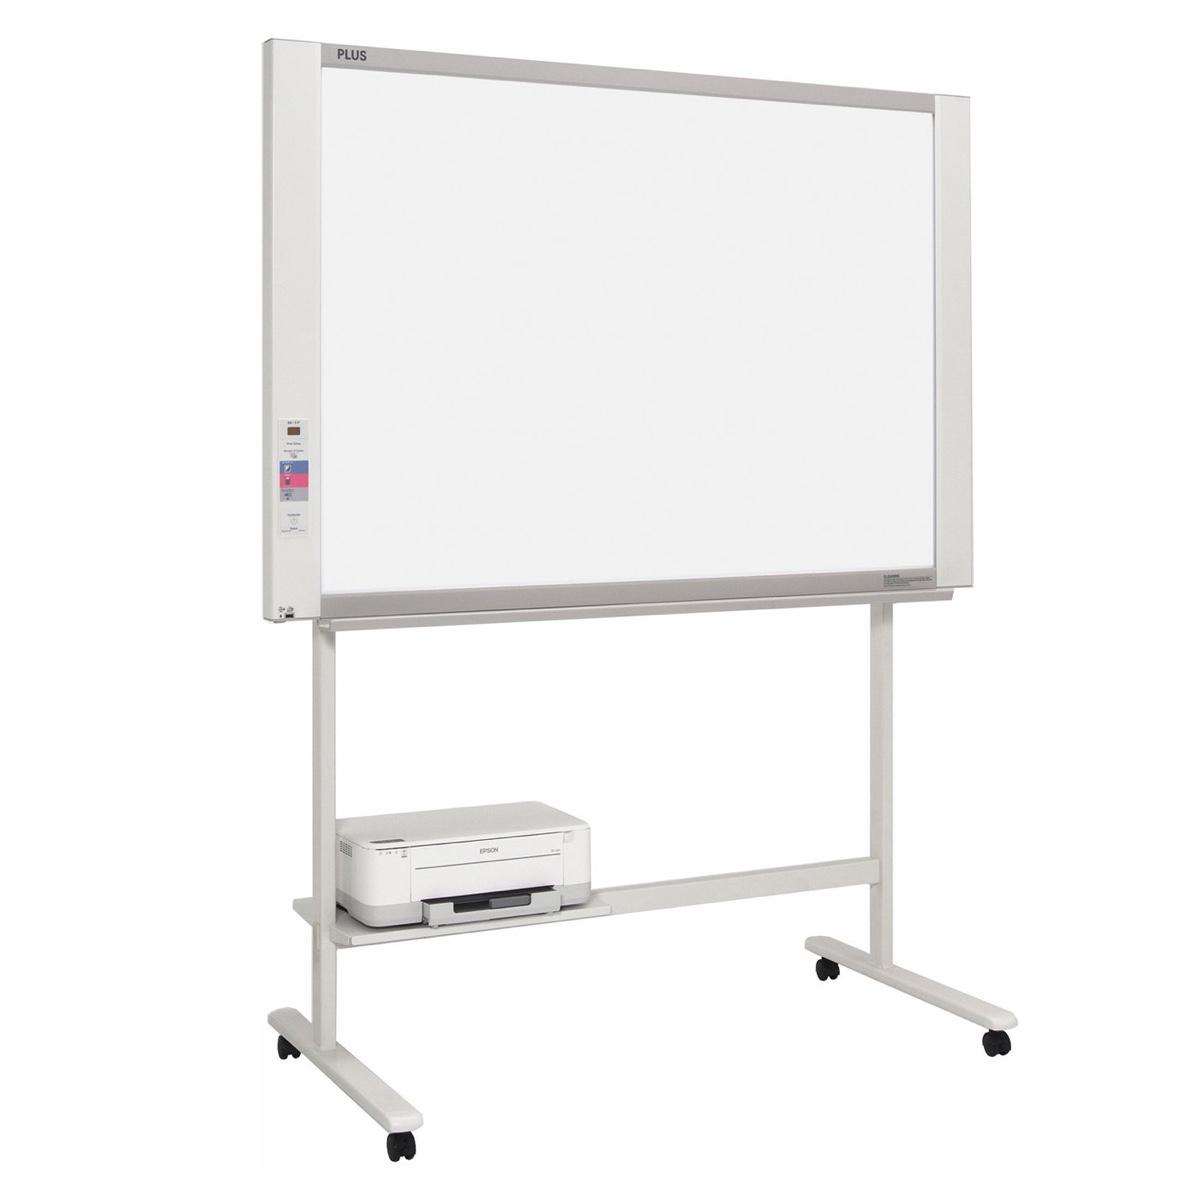 PLUS Whiteboards:  The PLUS Copyboard M-17S